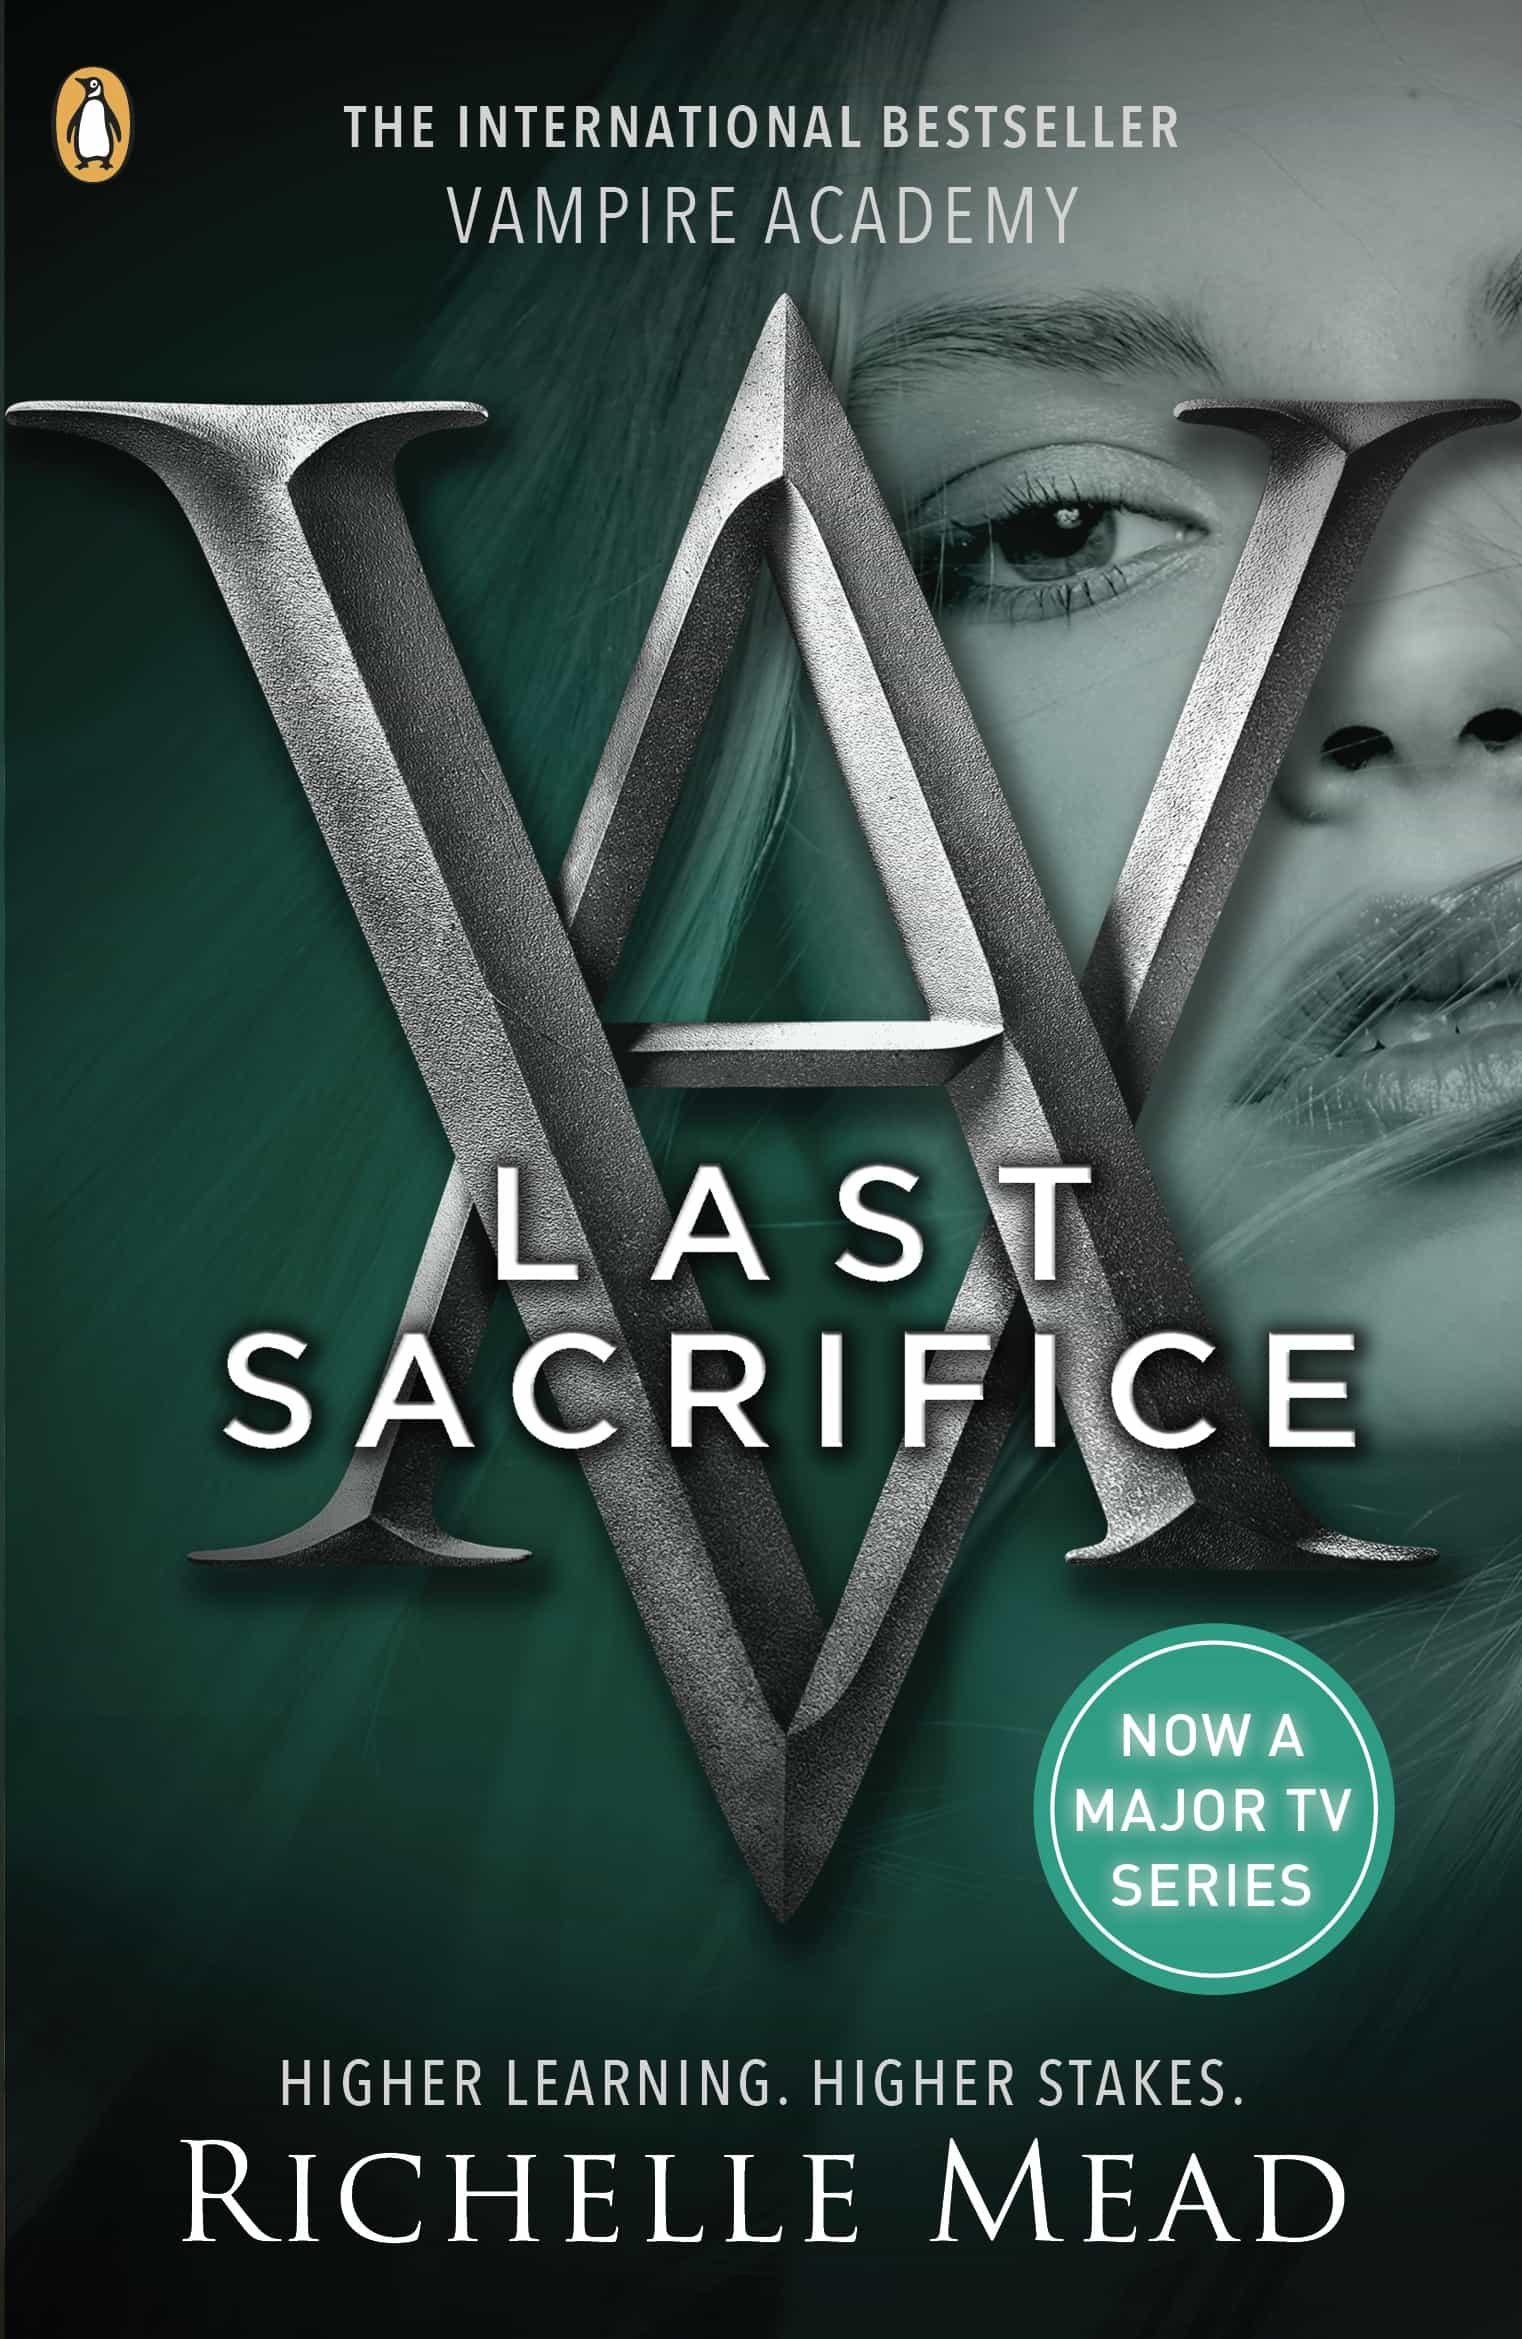 Vampire Academy Last Sacrifice Book 6 Ebook Richelle Mead